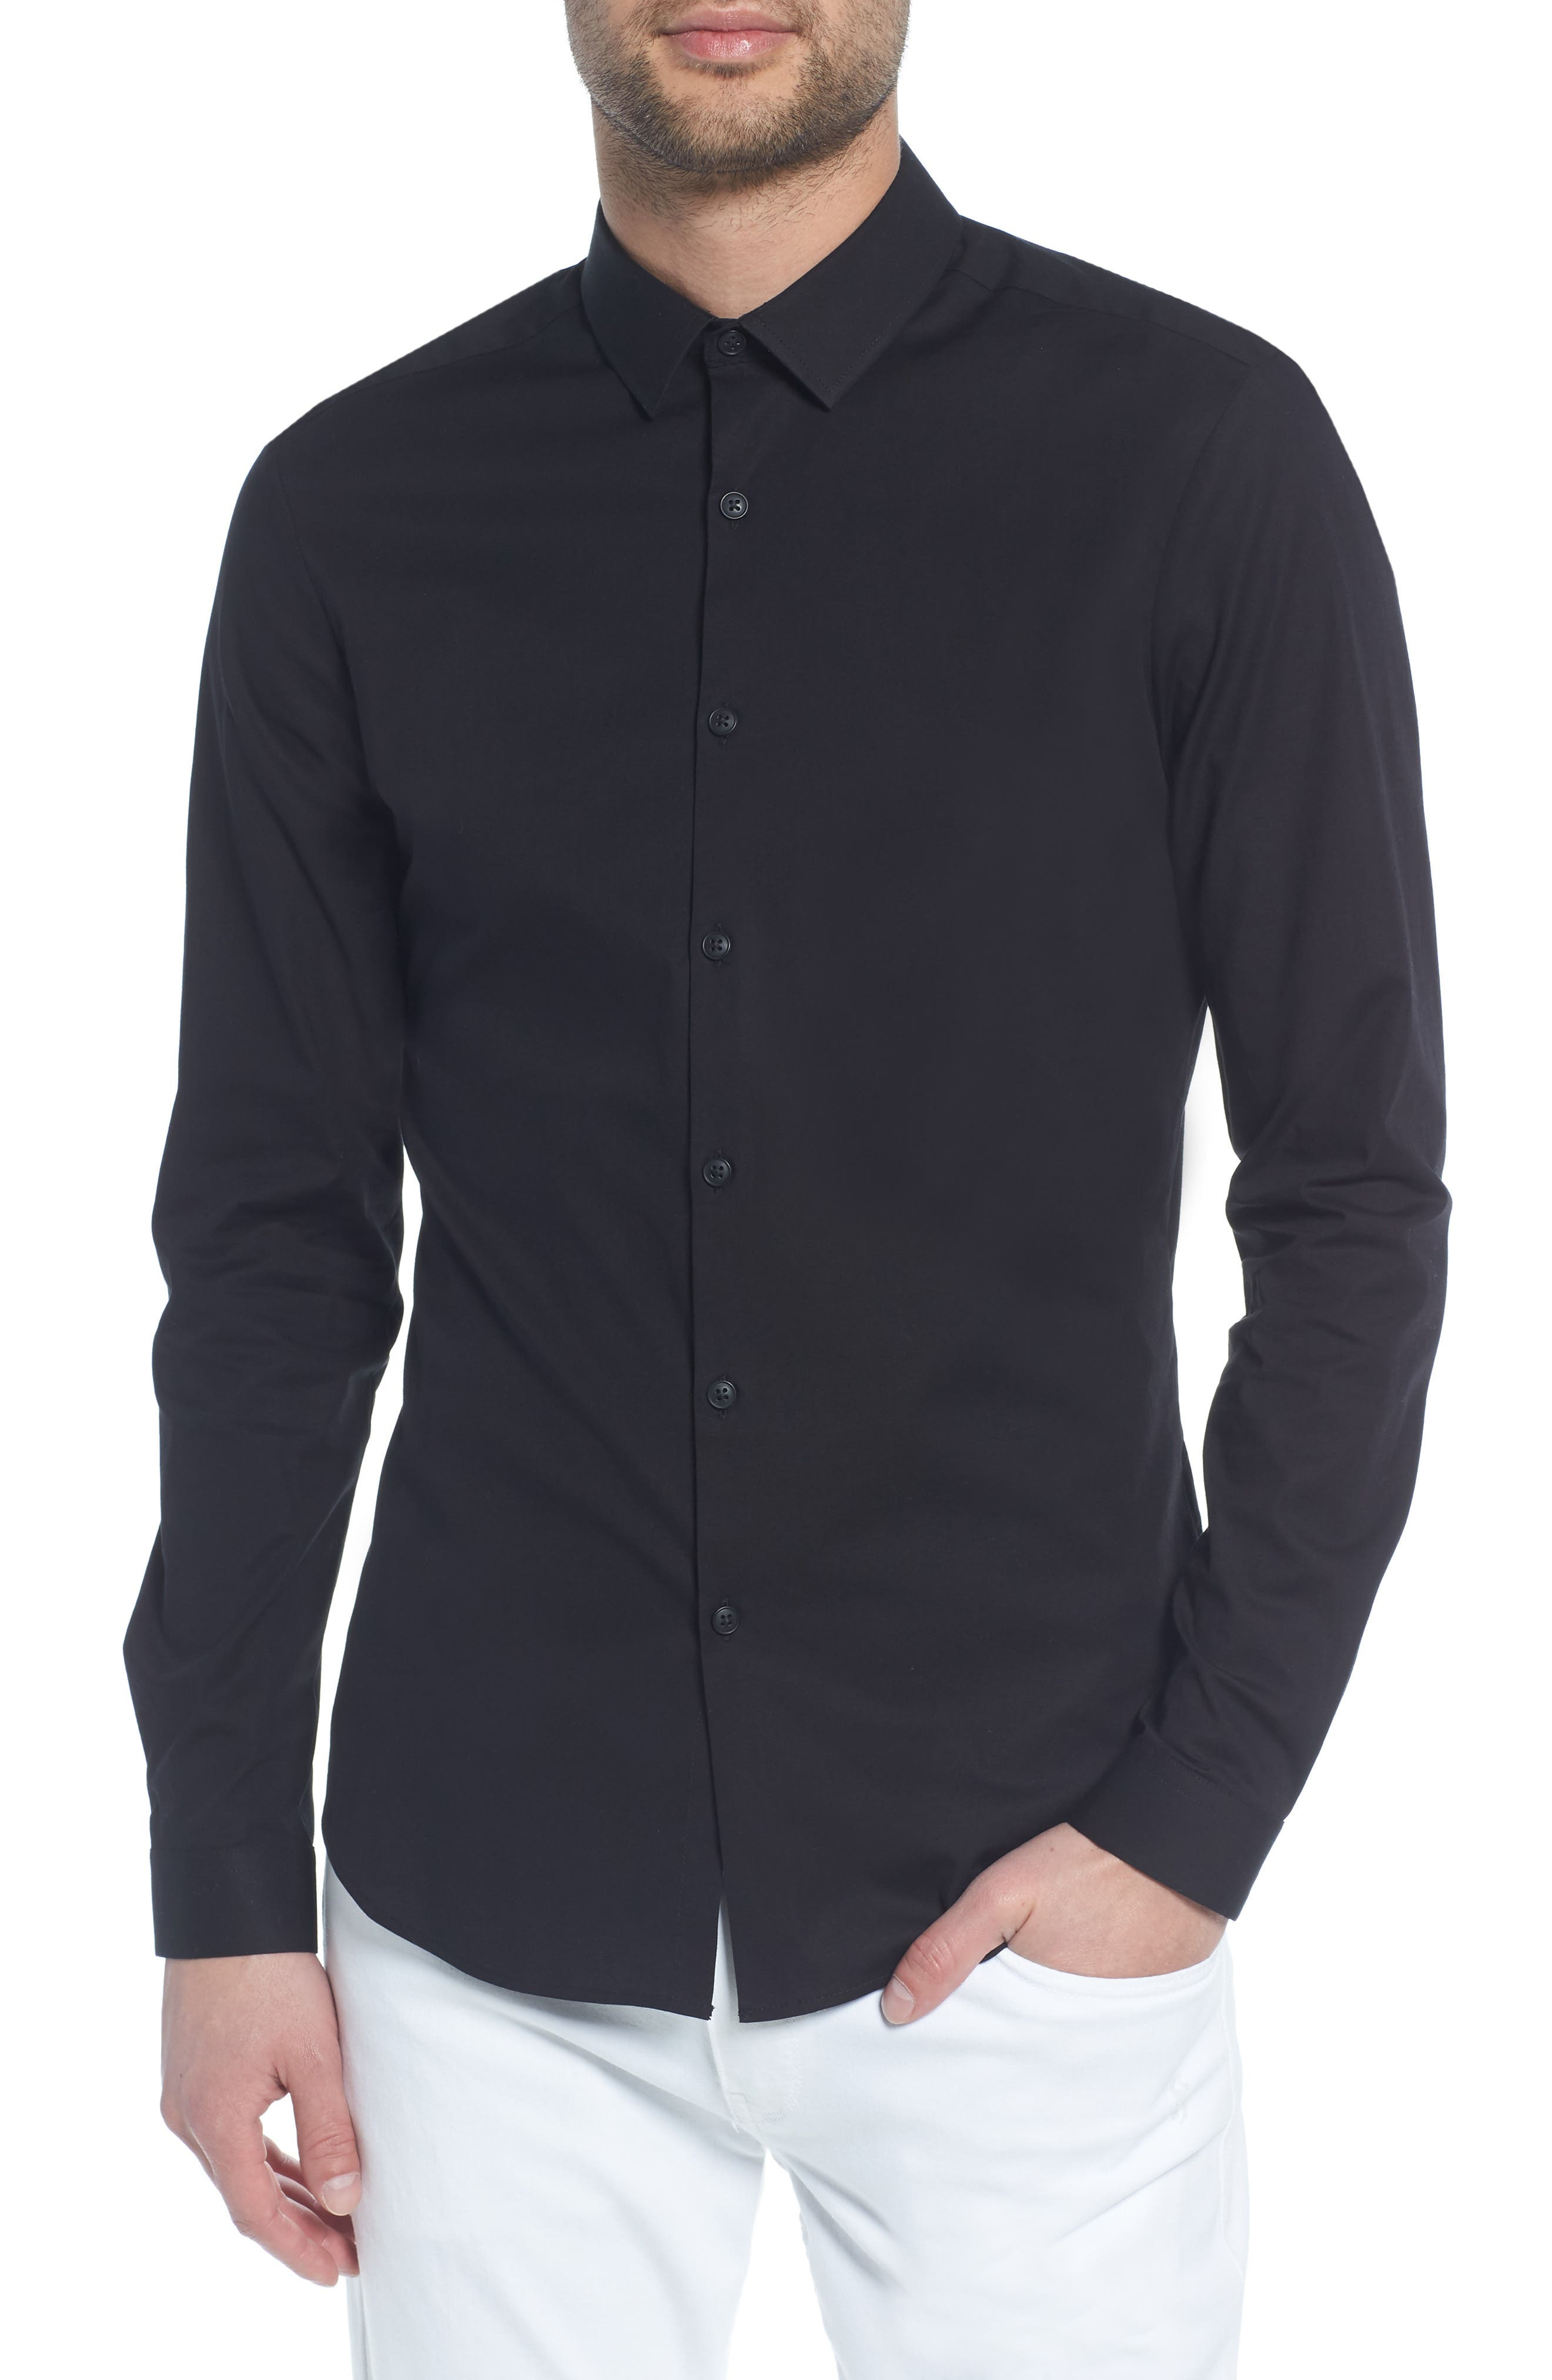 63f18c209d9 Topman Shirts